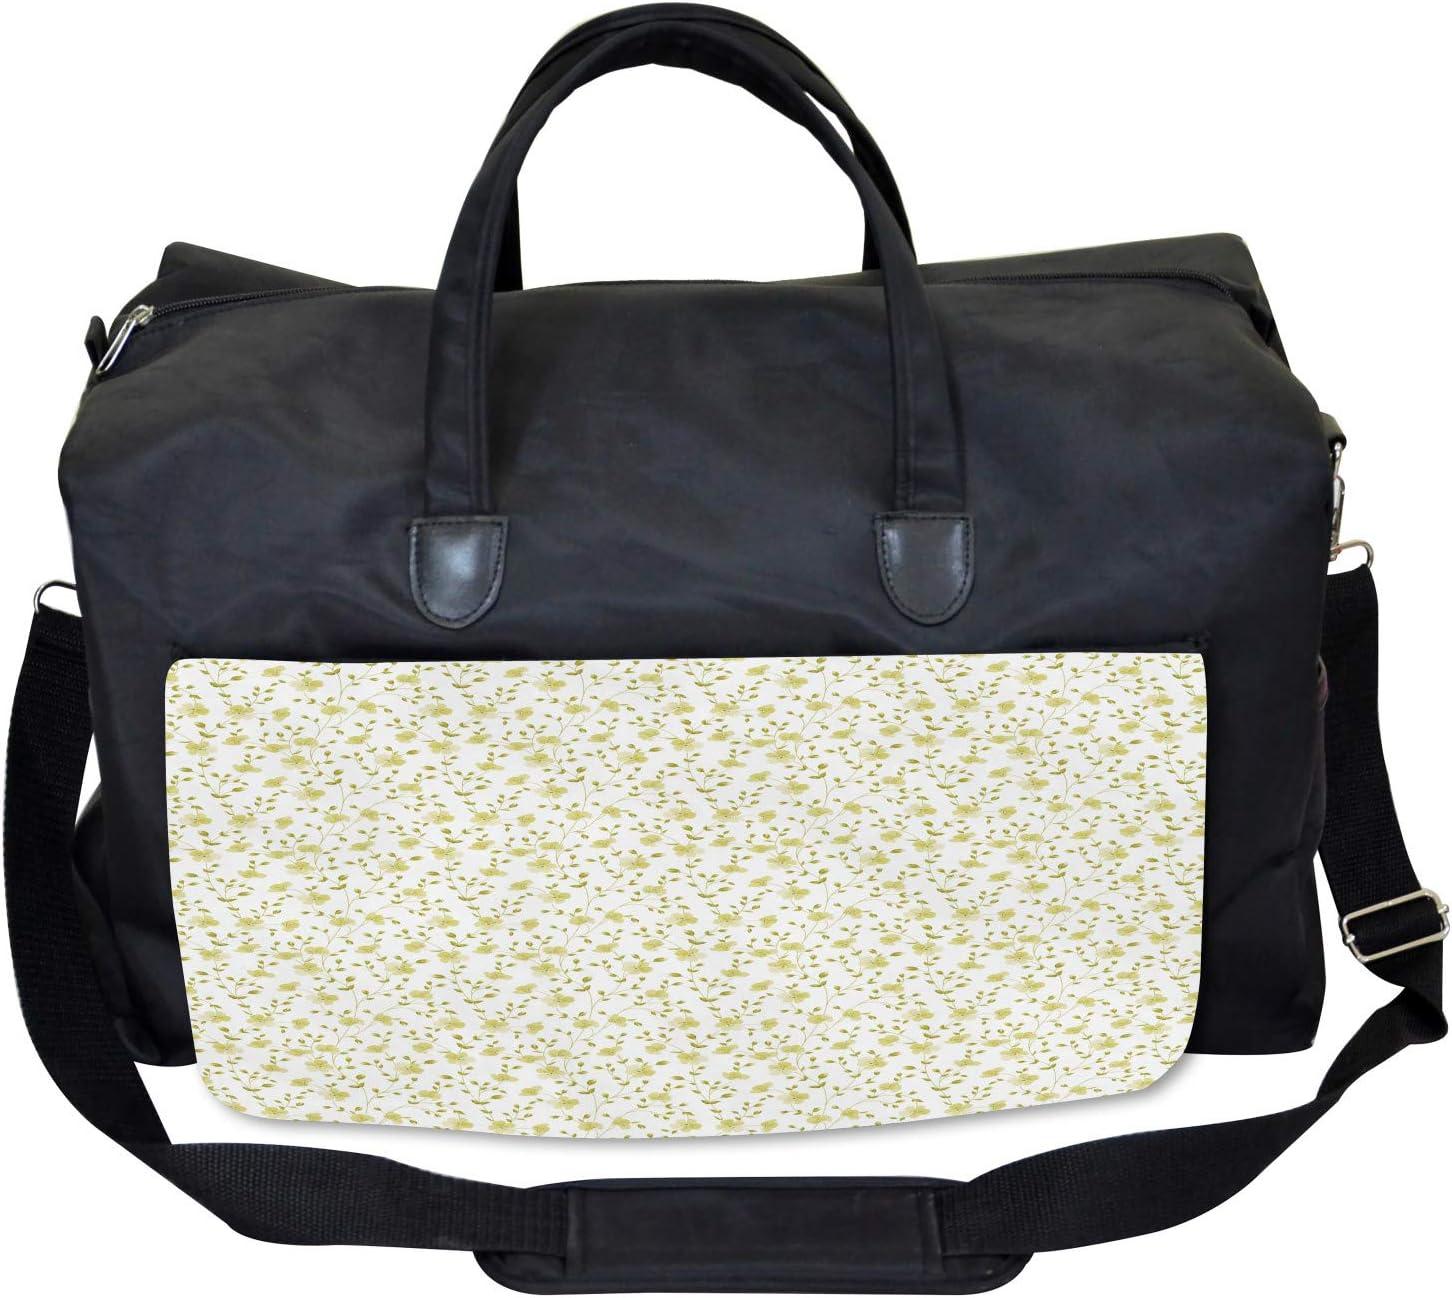 Ambesonne Summer Gym Bag Large Weekender Carry-on Floral Nature Botanical